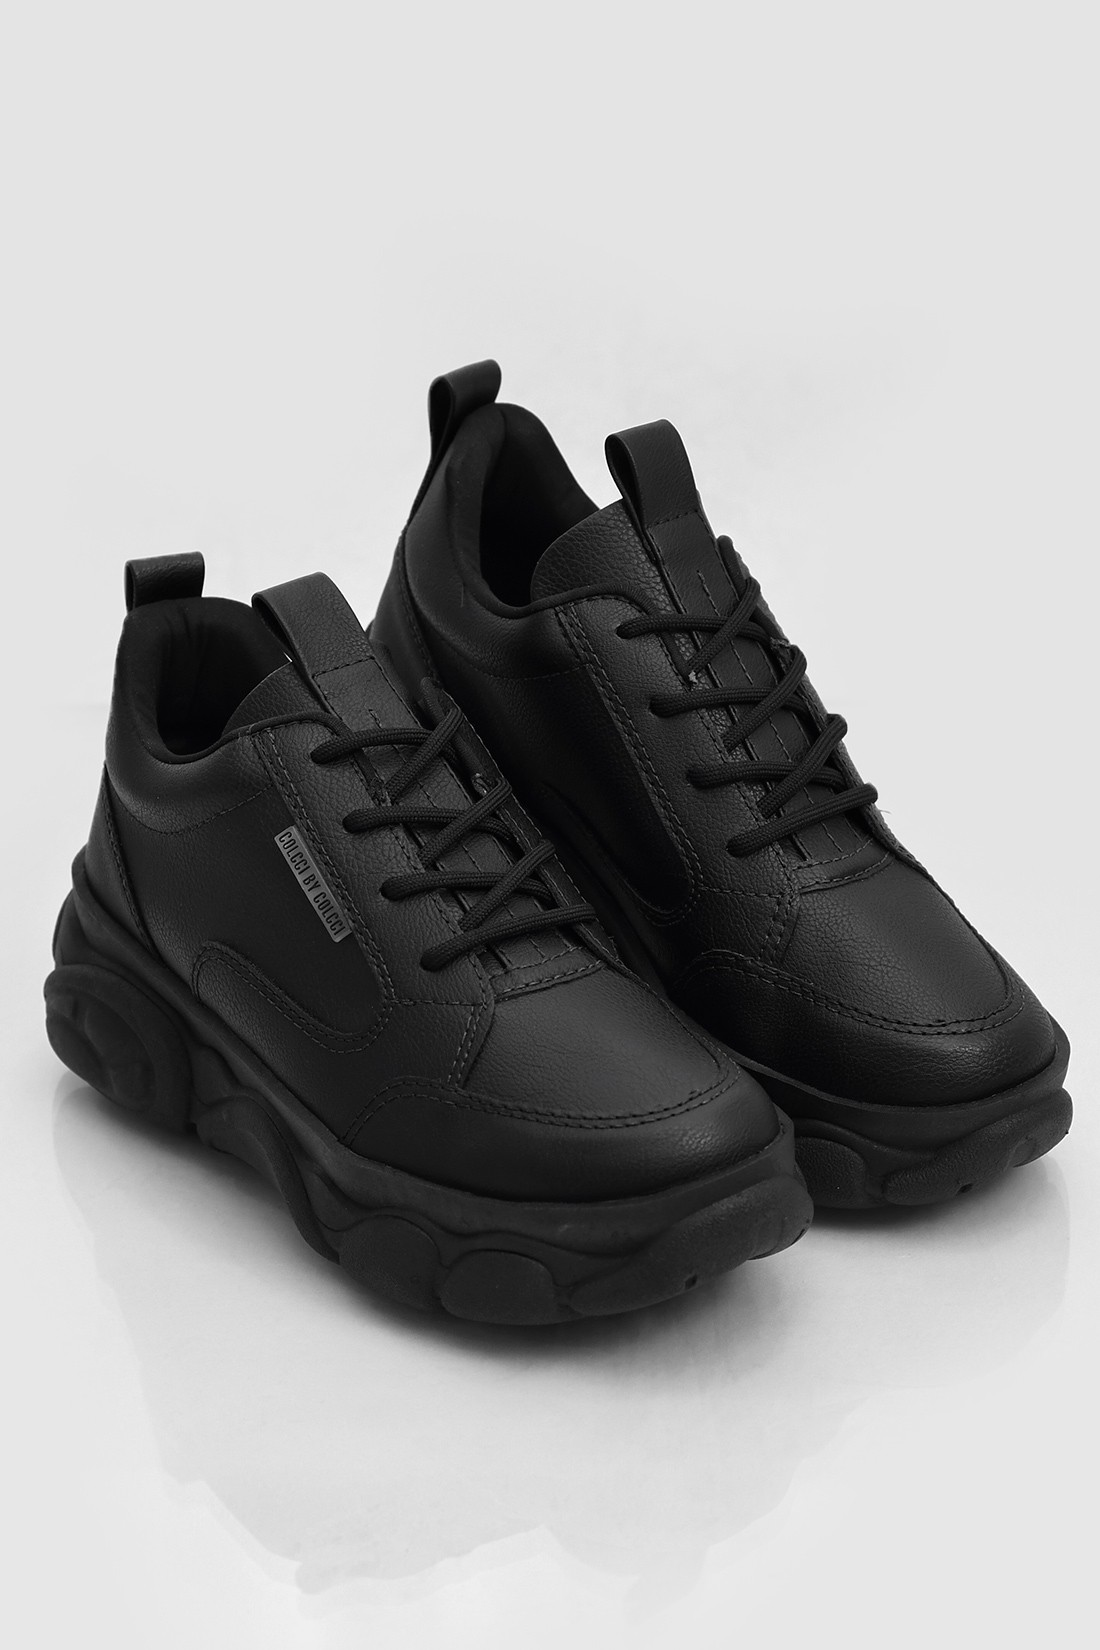 Tenis Ugly Sneaker Colcci Caprino